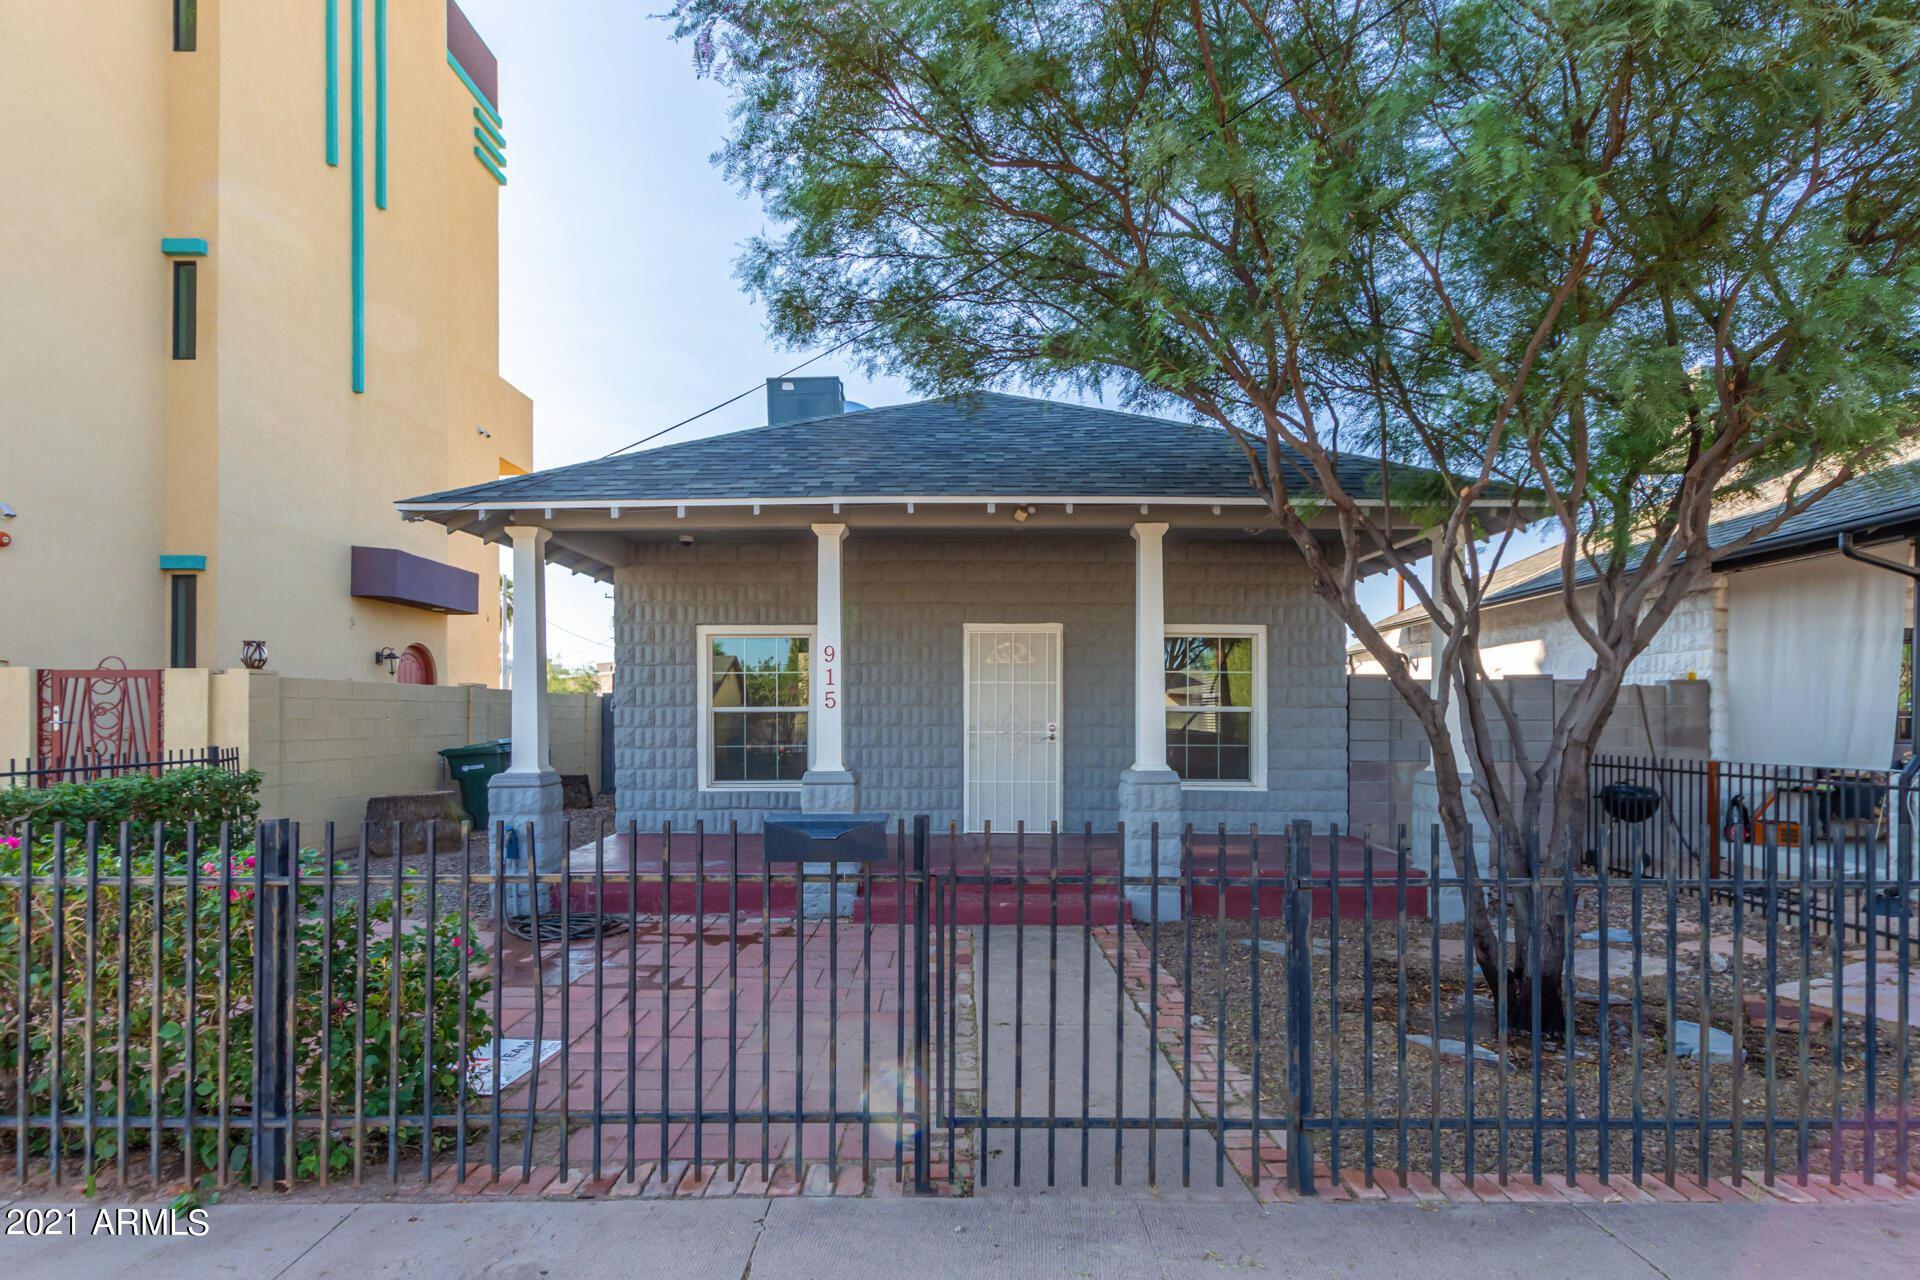 915 W FILLMORE Street, Phoenix, AZ 85007 - MLS#: 6296892